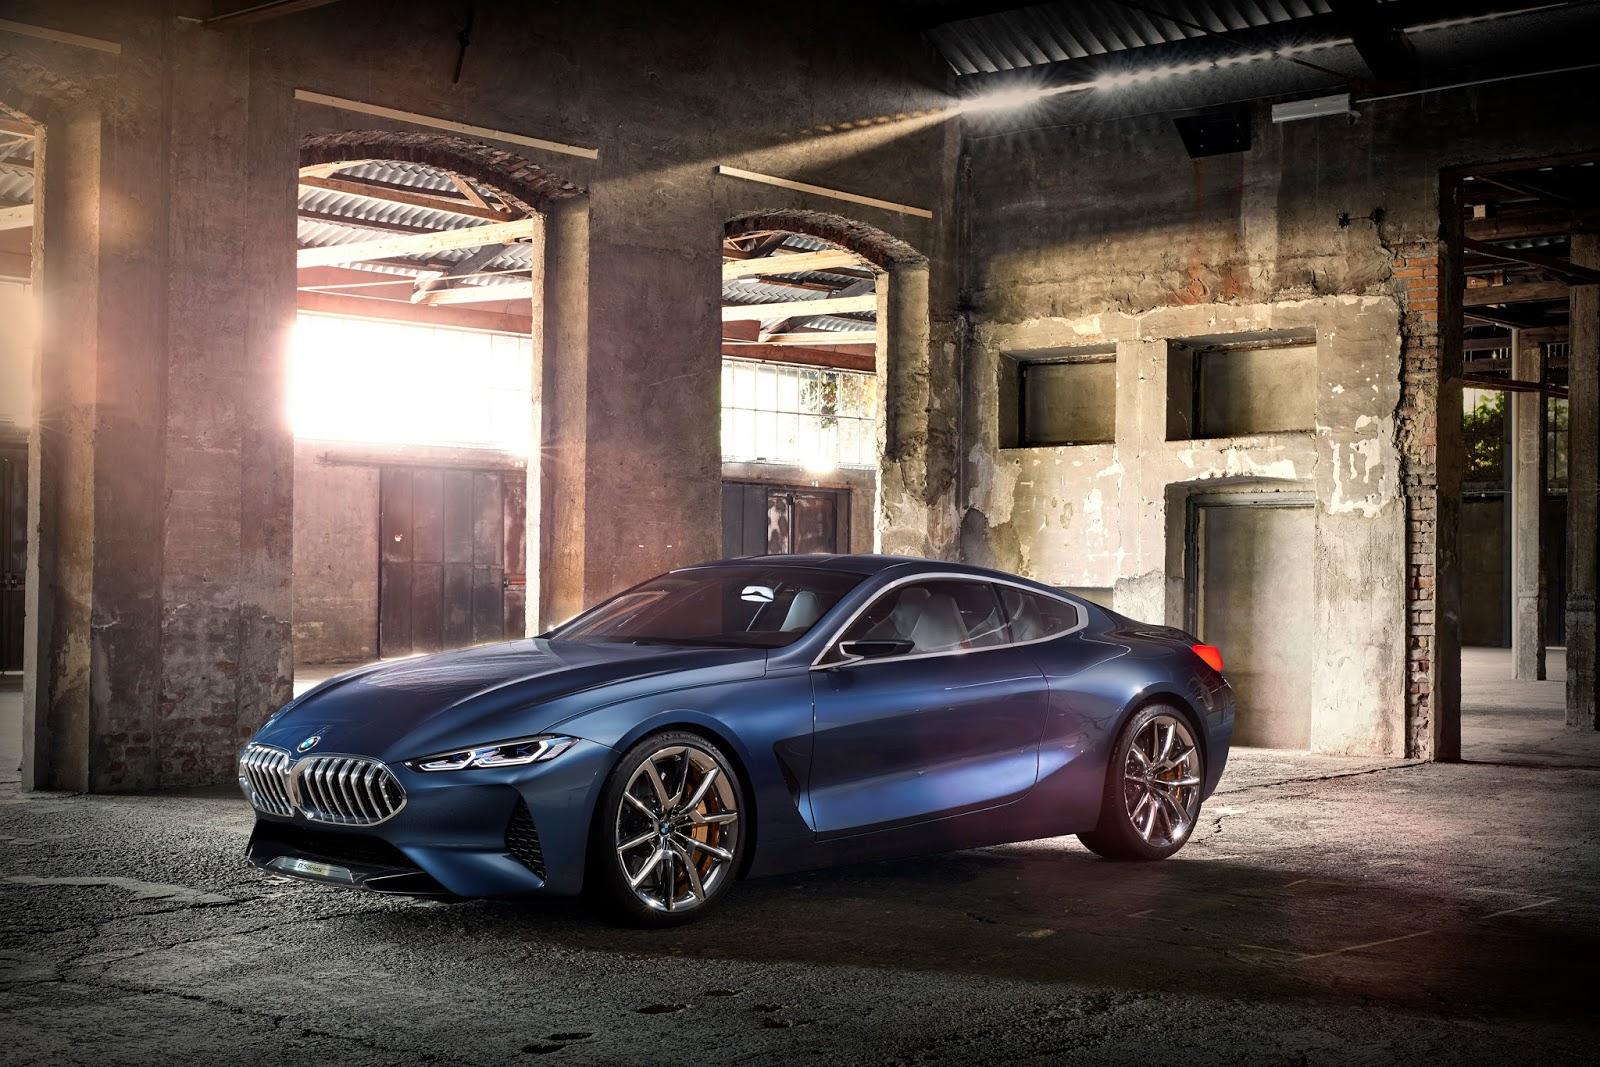 P90261125 highRes bmw concept 8 series Η BMW Σειρά 8 Coupe είναι η πεμπτουσία των μελλοντικών σπορ αυτοκινήτων BMW, BMW 8, BMW Concept, BMW Concept 8 Series, COUPE, dream car